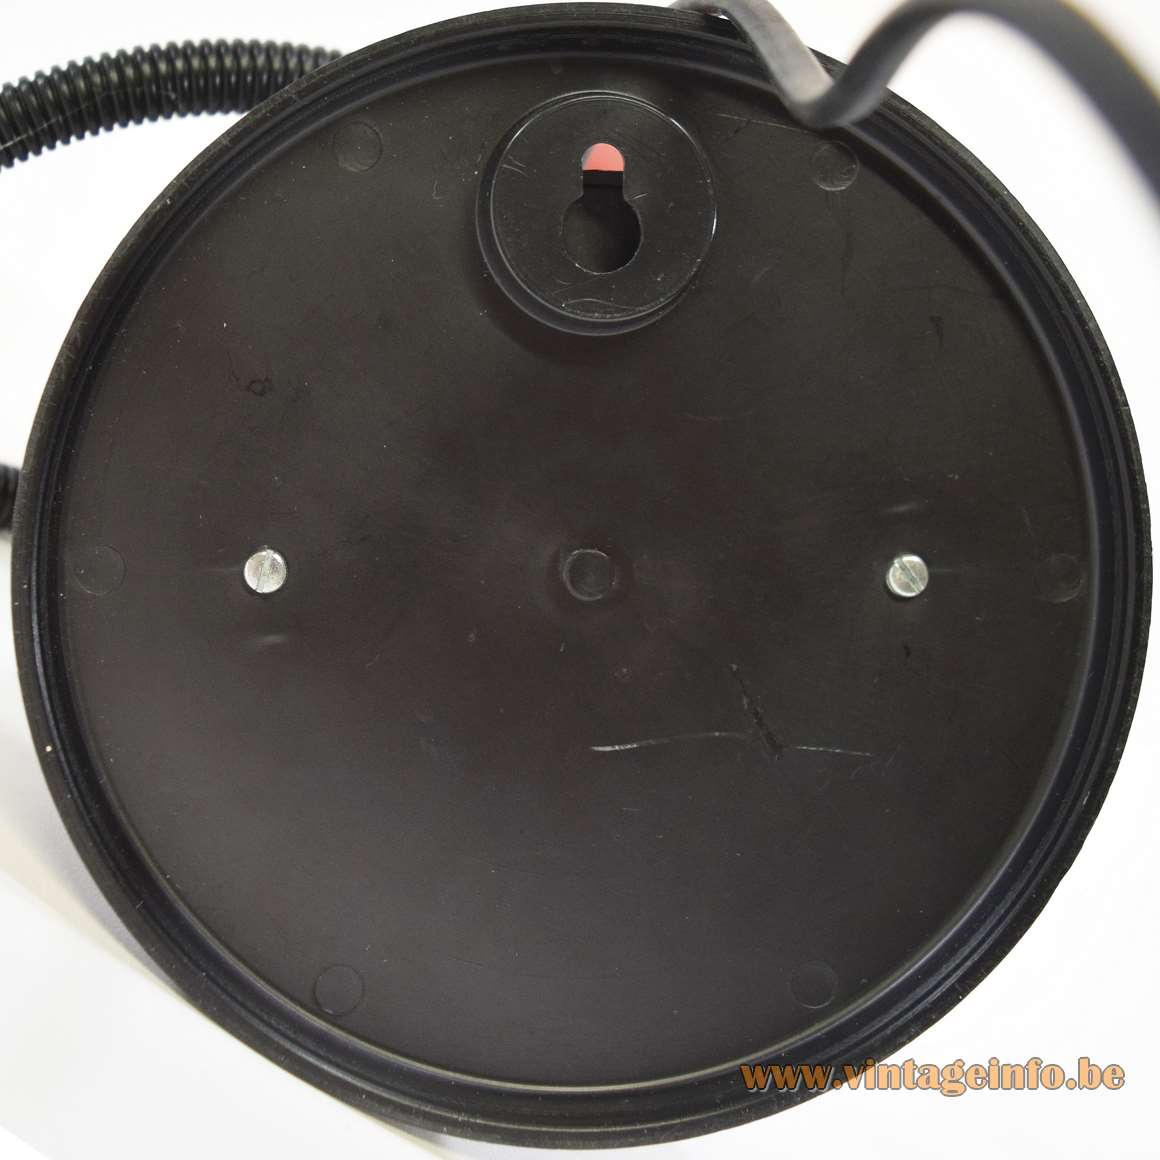 1970s magnetic table lamp red metal globe black plastic Germany MCM 1980s BJB